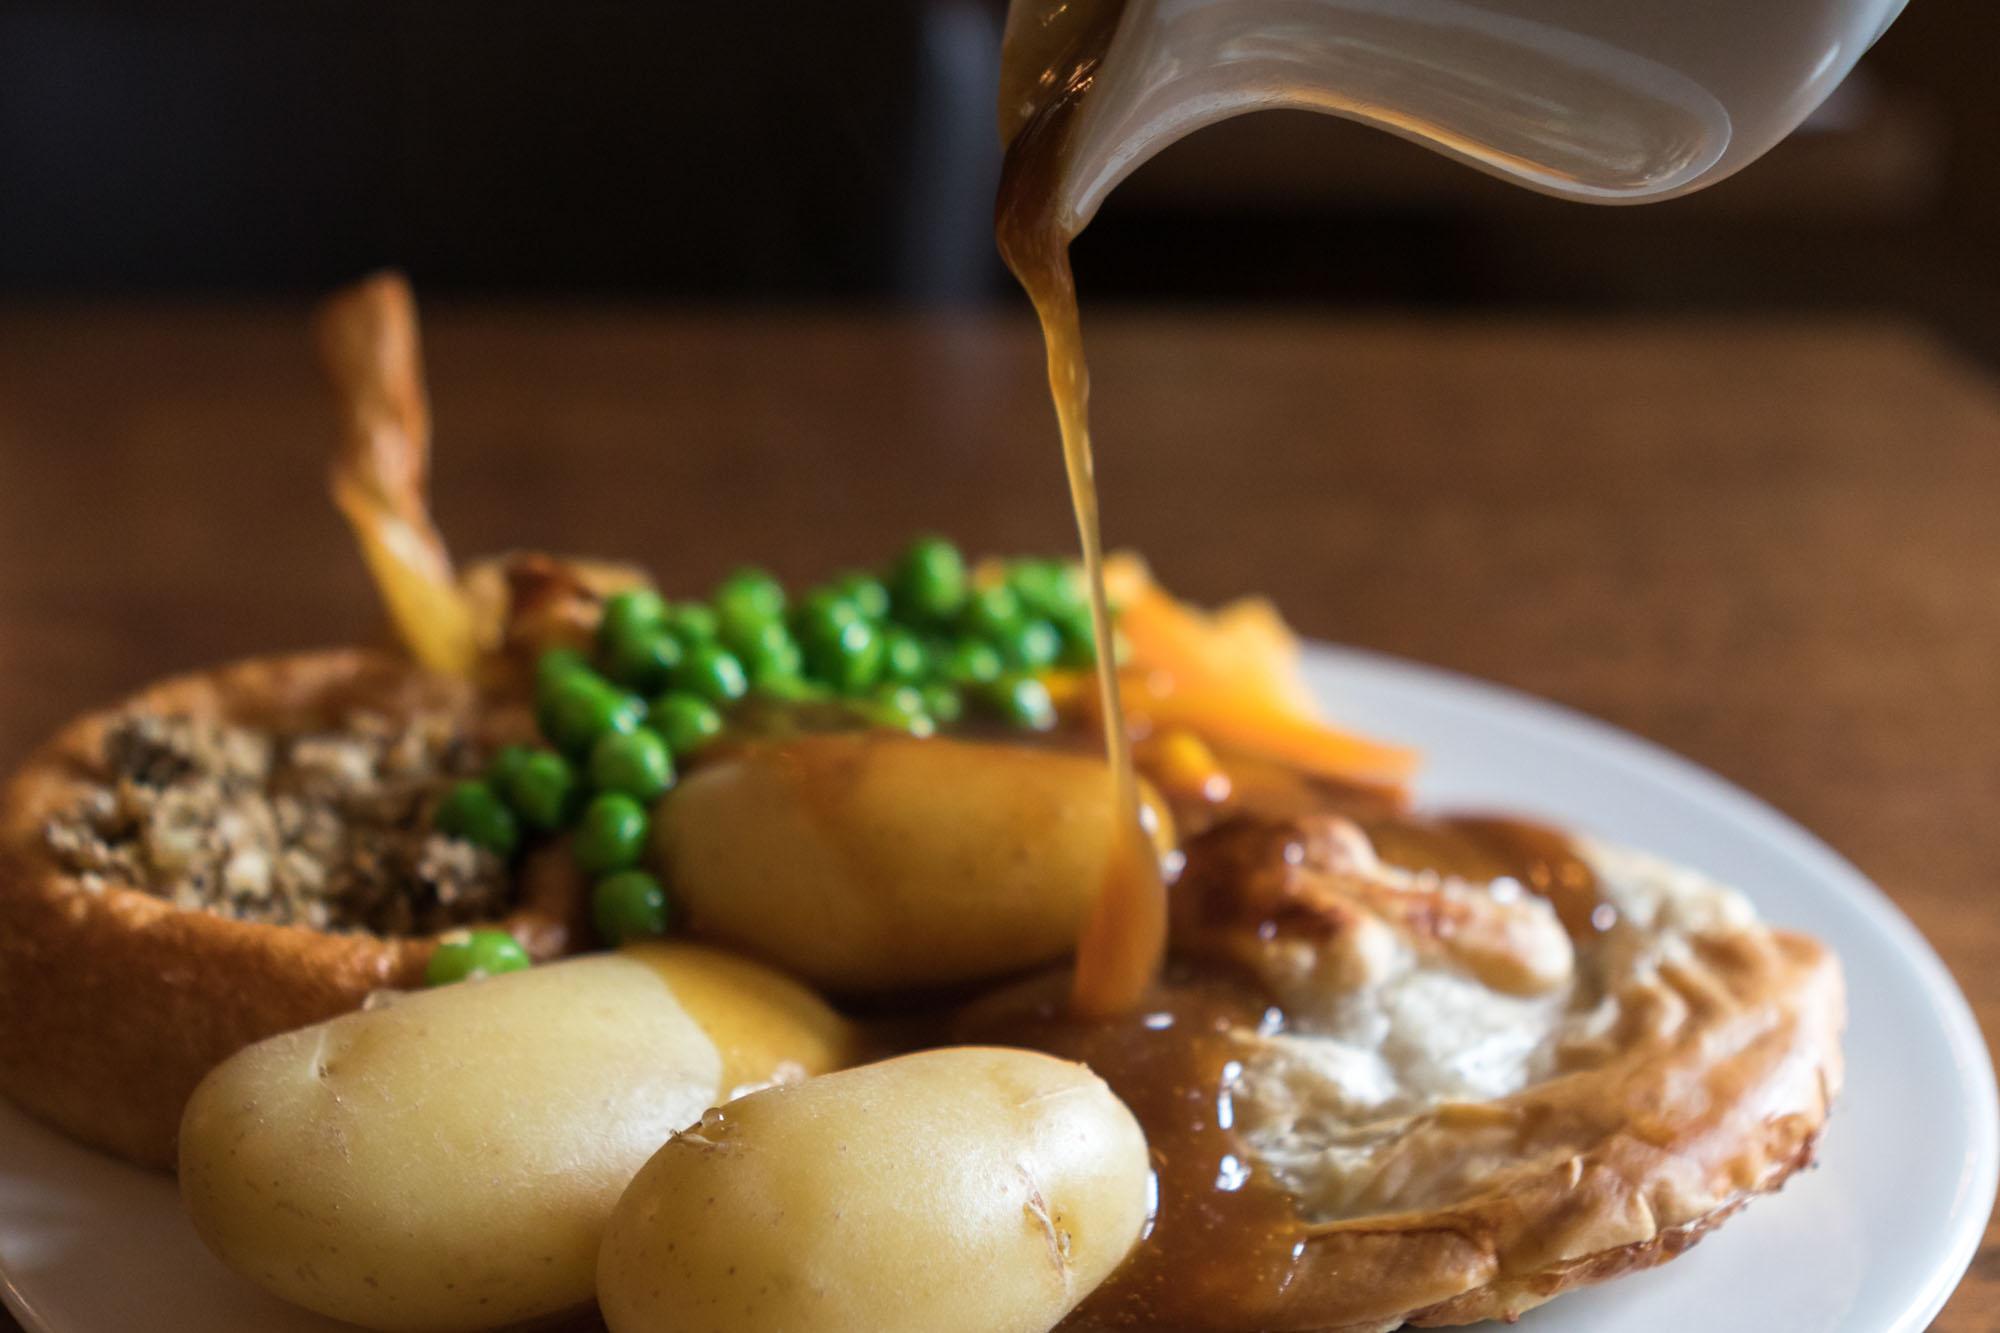 Swansea Food Photographer